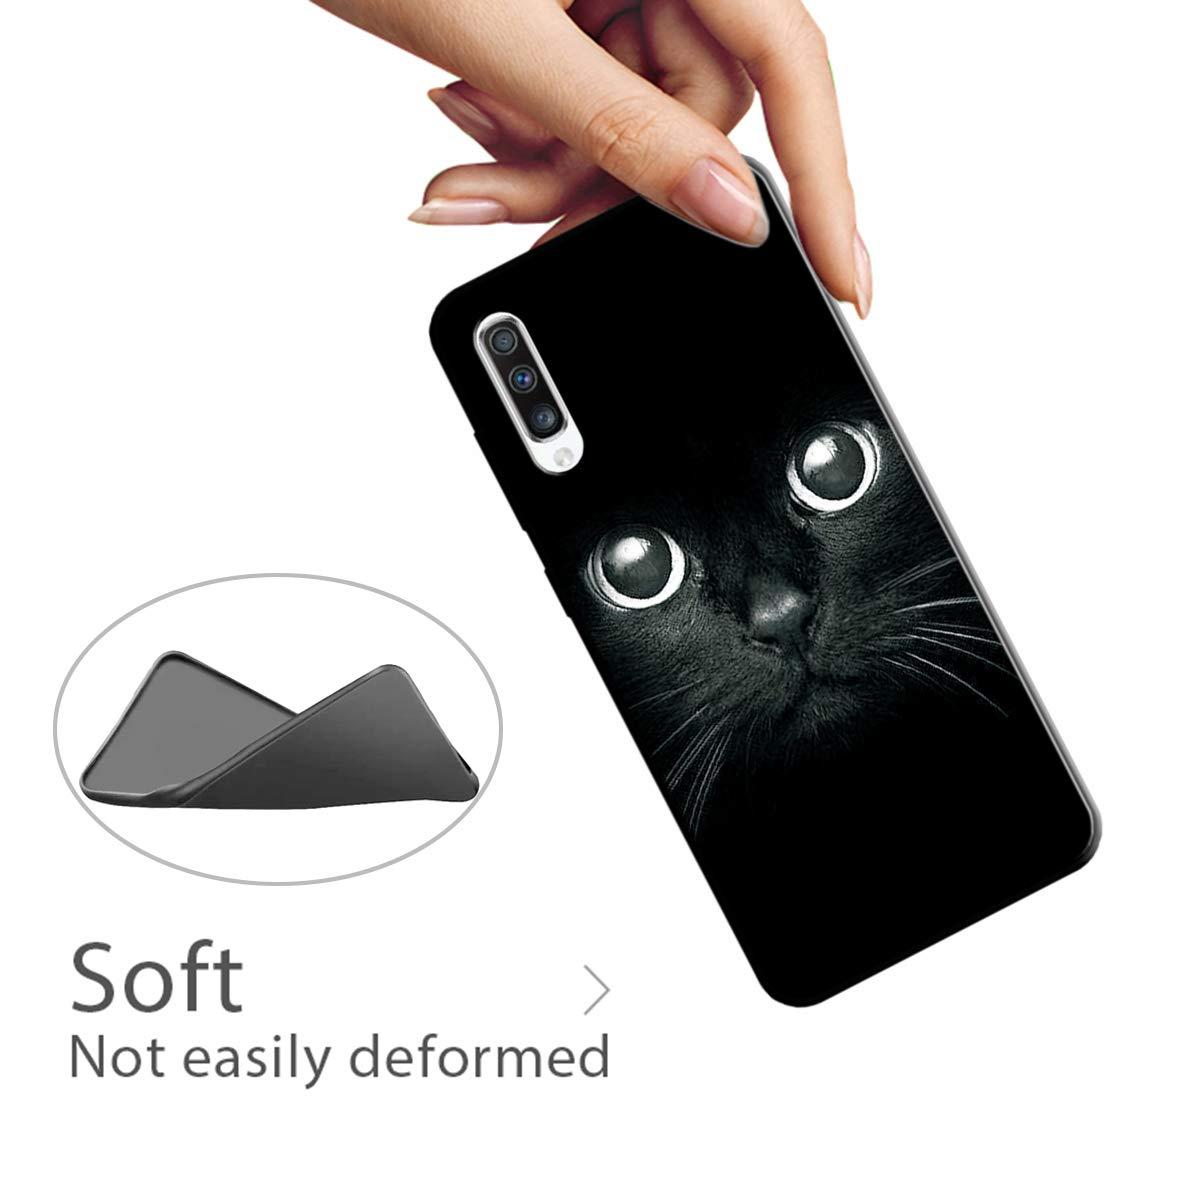 Funda Samsung Galaxy A70 Carcasa para Samsung Galaxy A70 Silicona Antigolpes Suave Flexible TPU Ultra Delgado Ligero Gel Goma Cubierta Case Jalea Protectora Bumper Negro Tigre